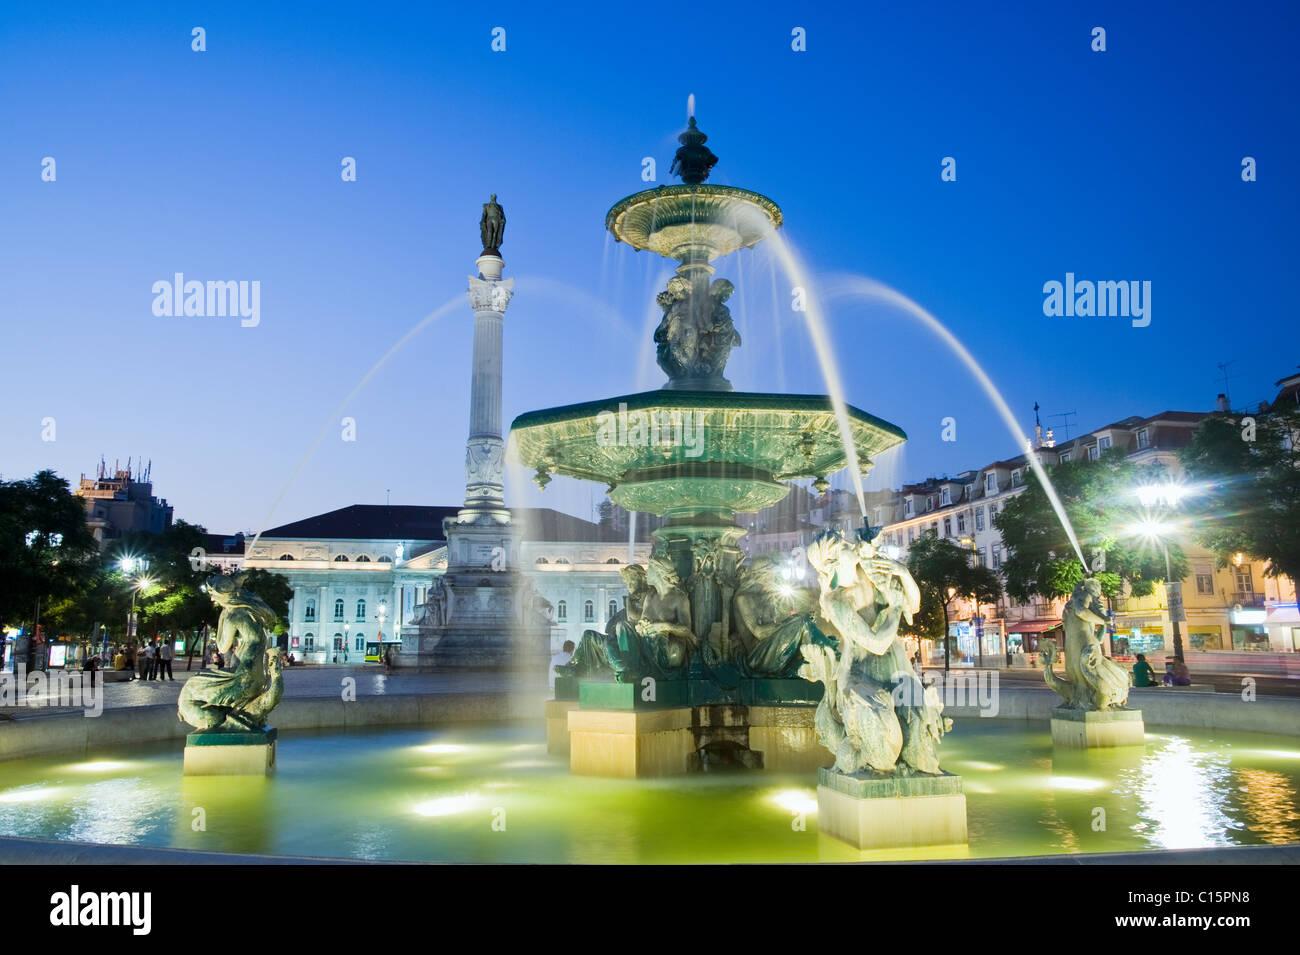 Praca do Pedro IV square (Rossio Square), Lisbon, Portugal - Stock Image